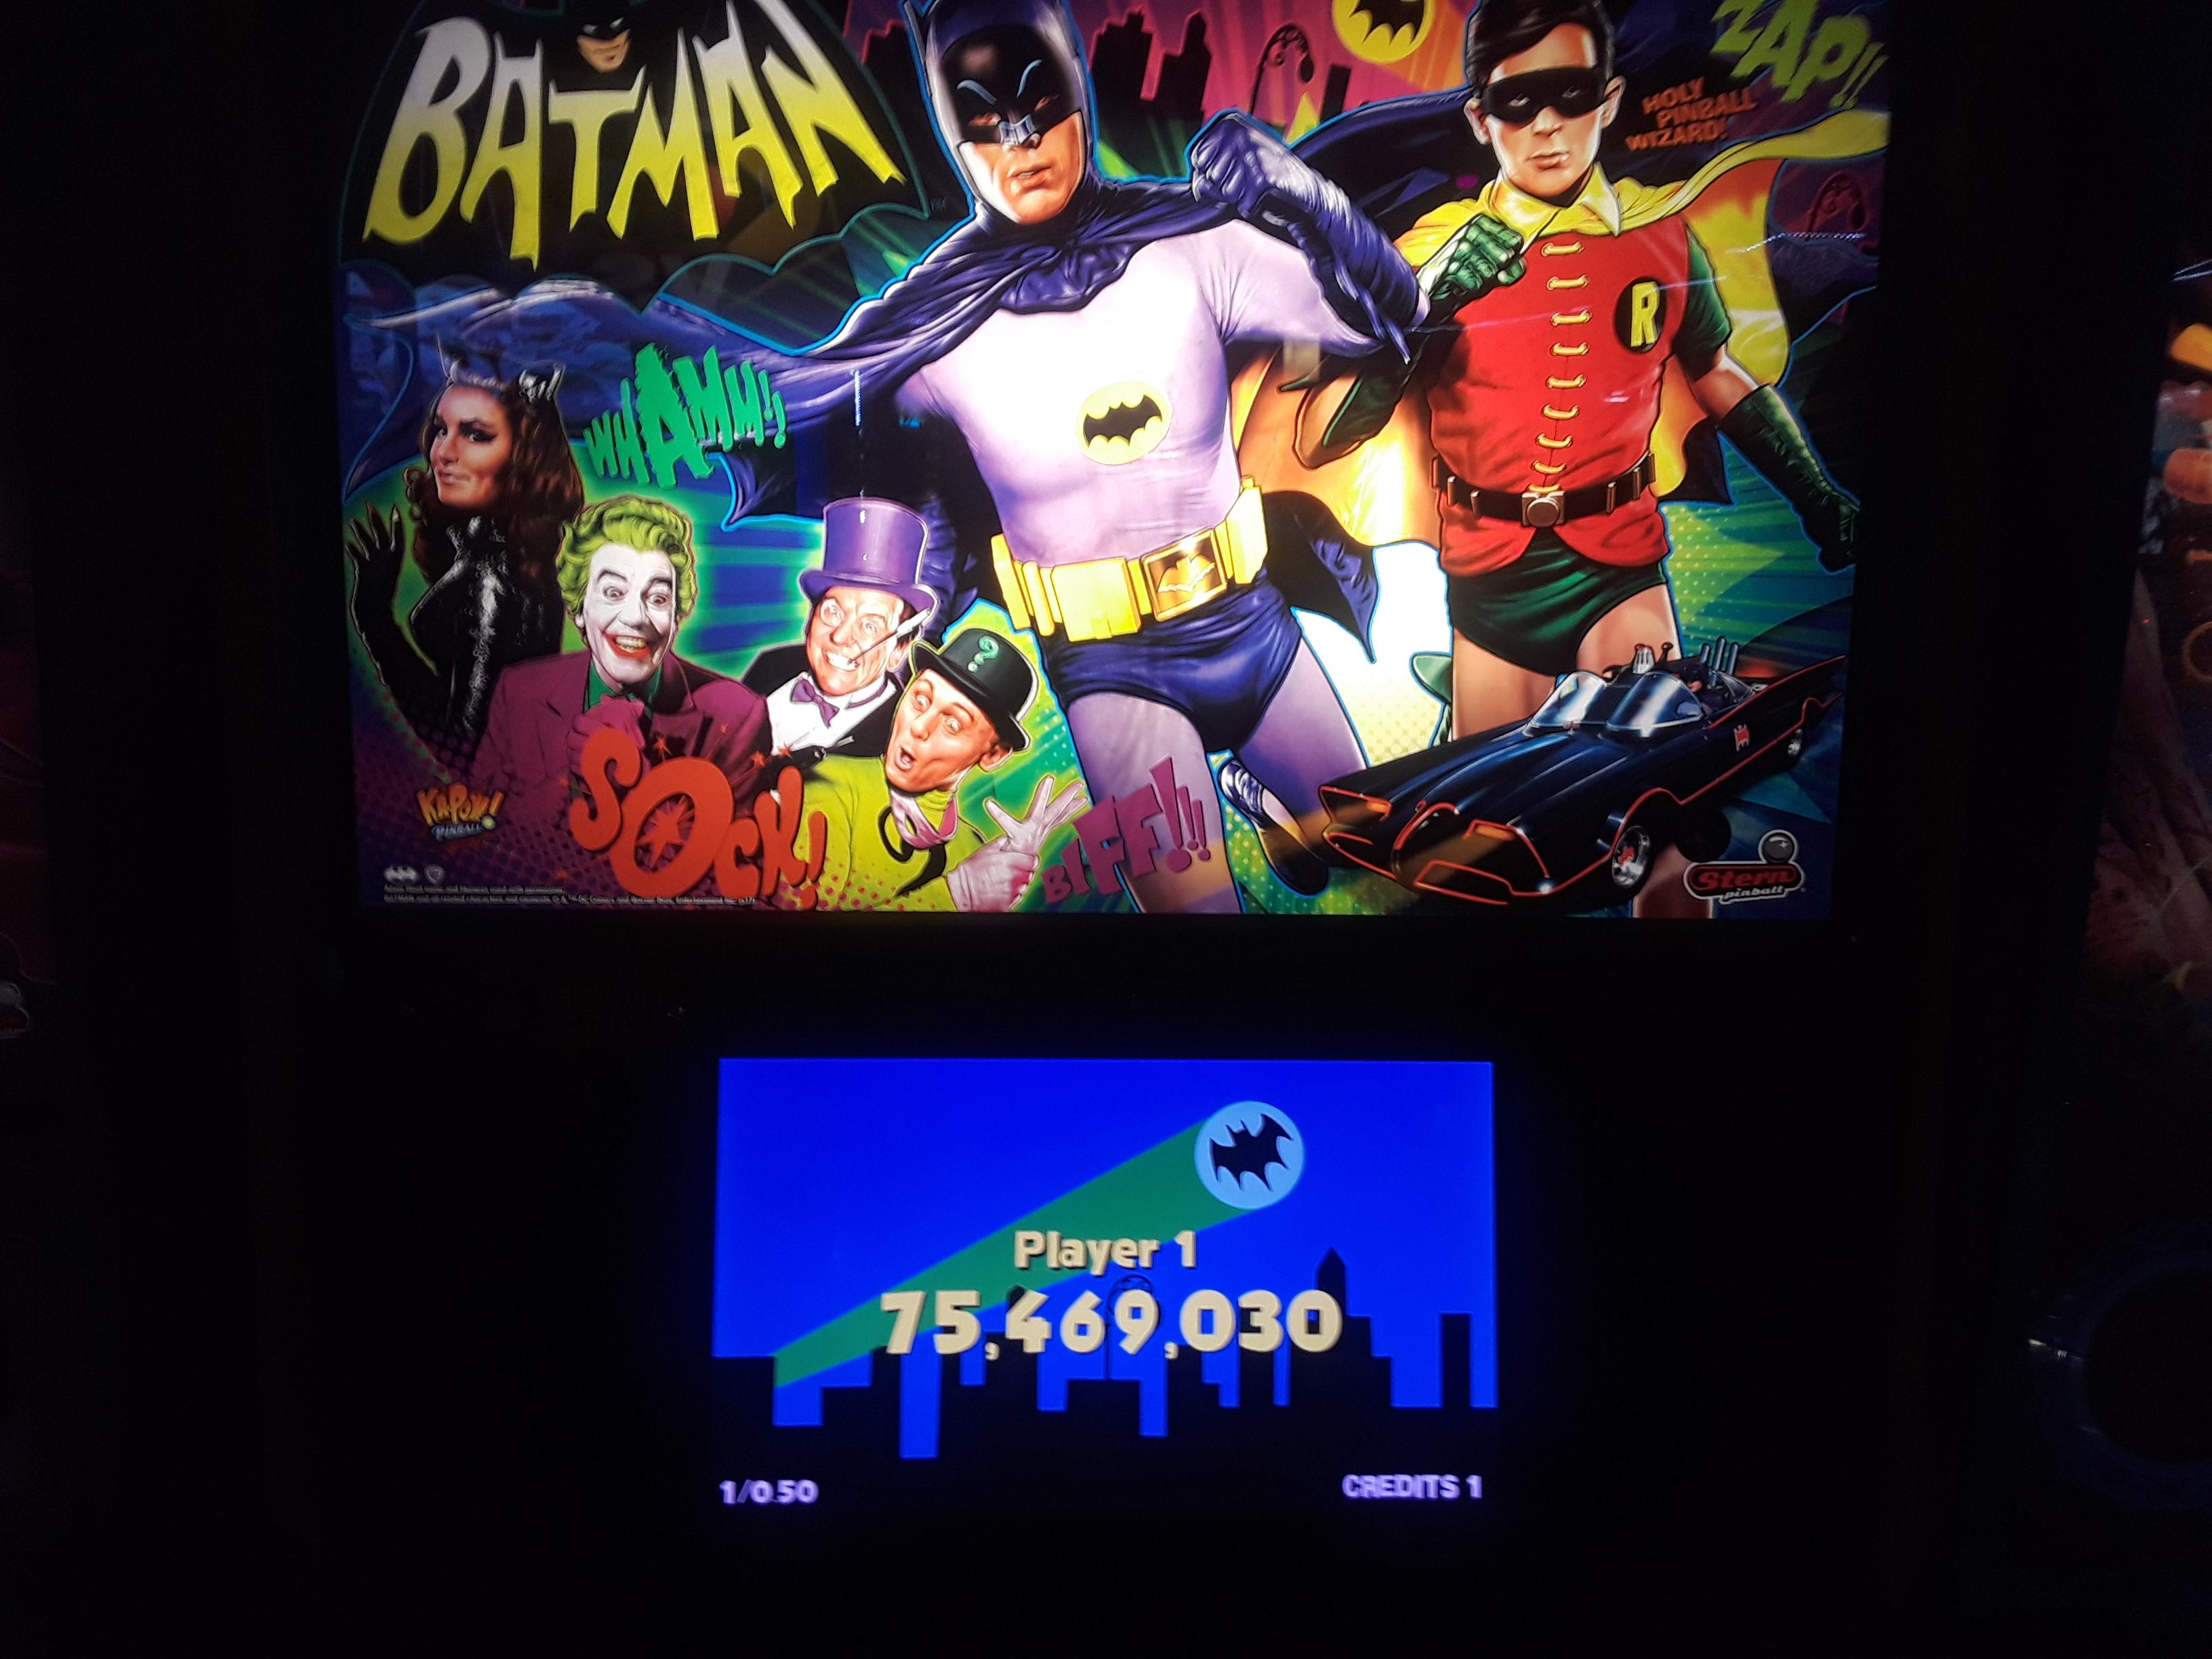 JML101582: Batman